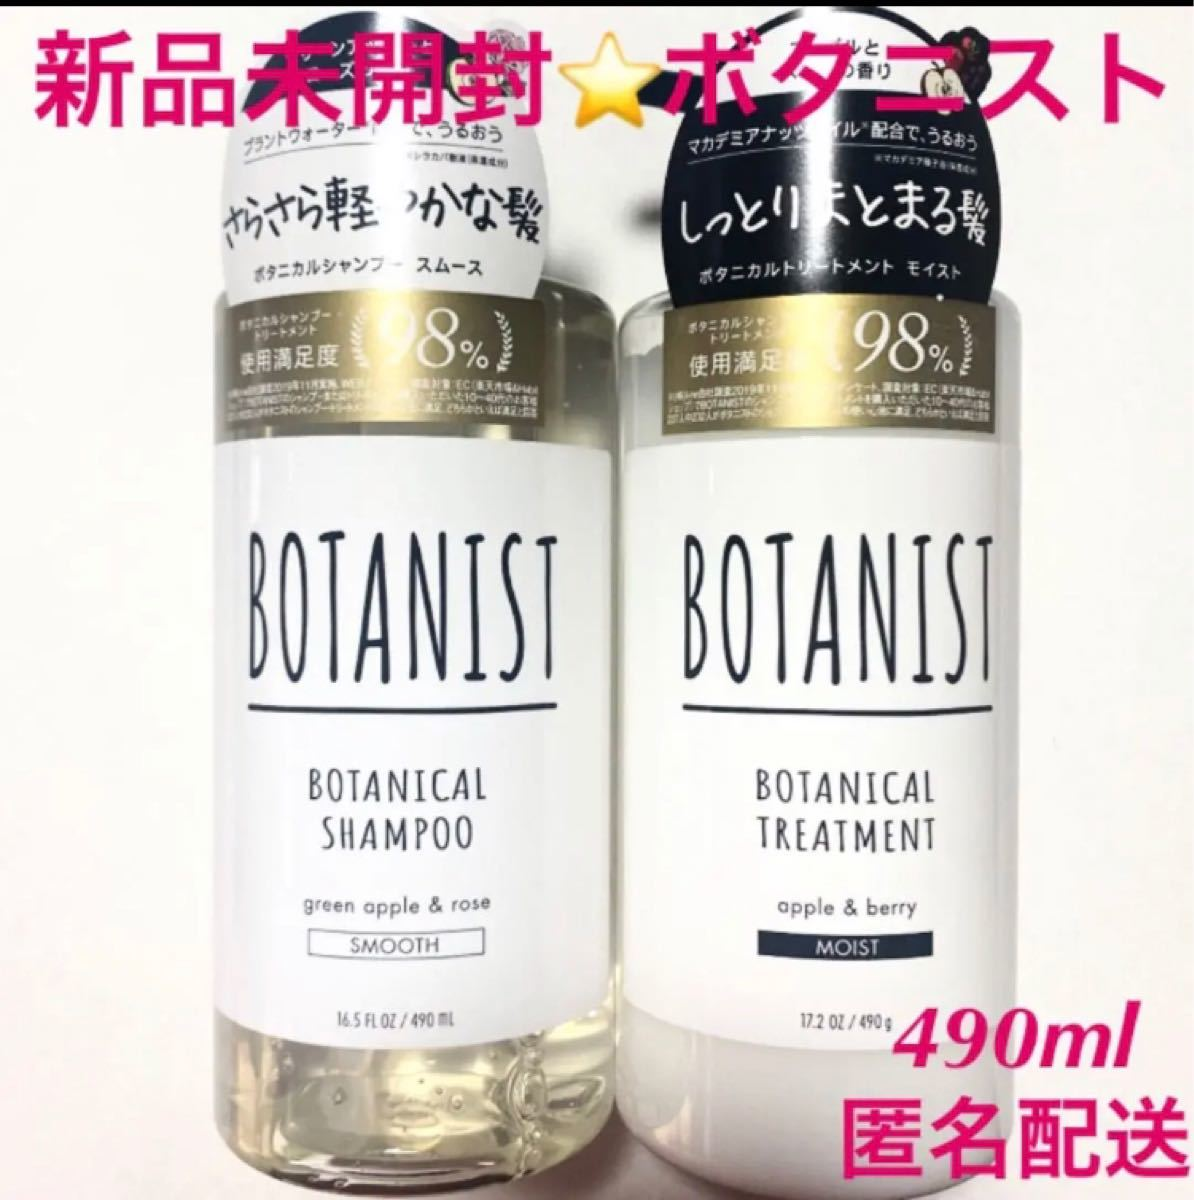 BOTANIST ボタニカルシャンプー/トリートメント モイスト